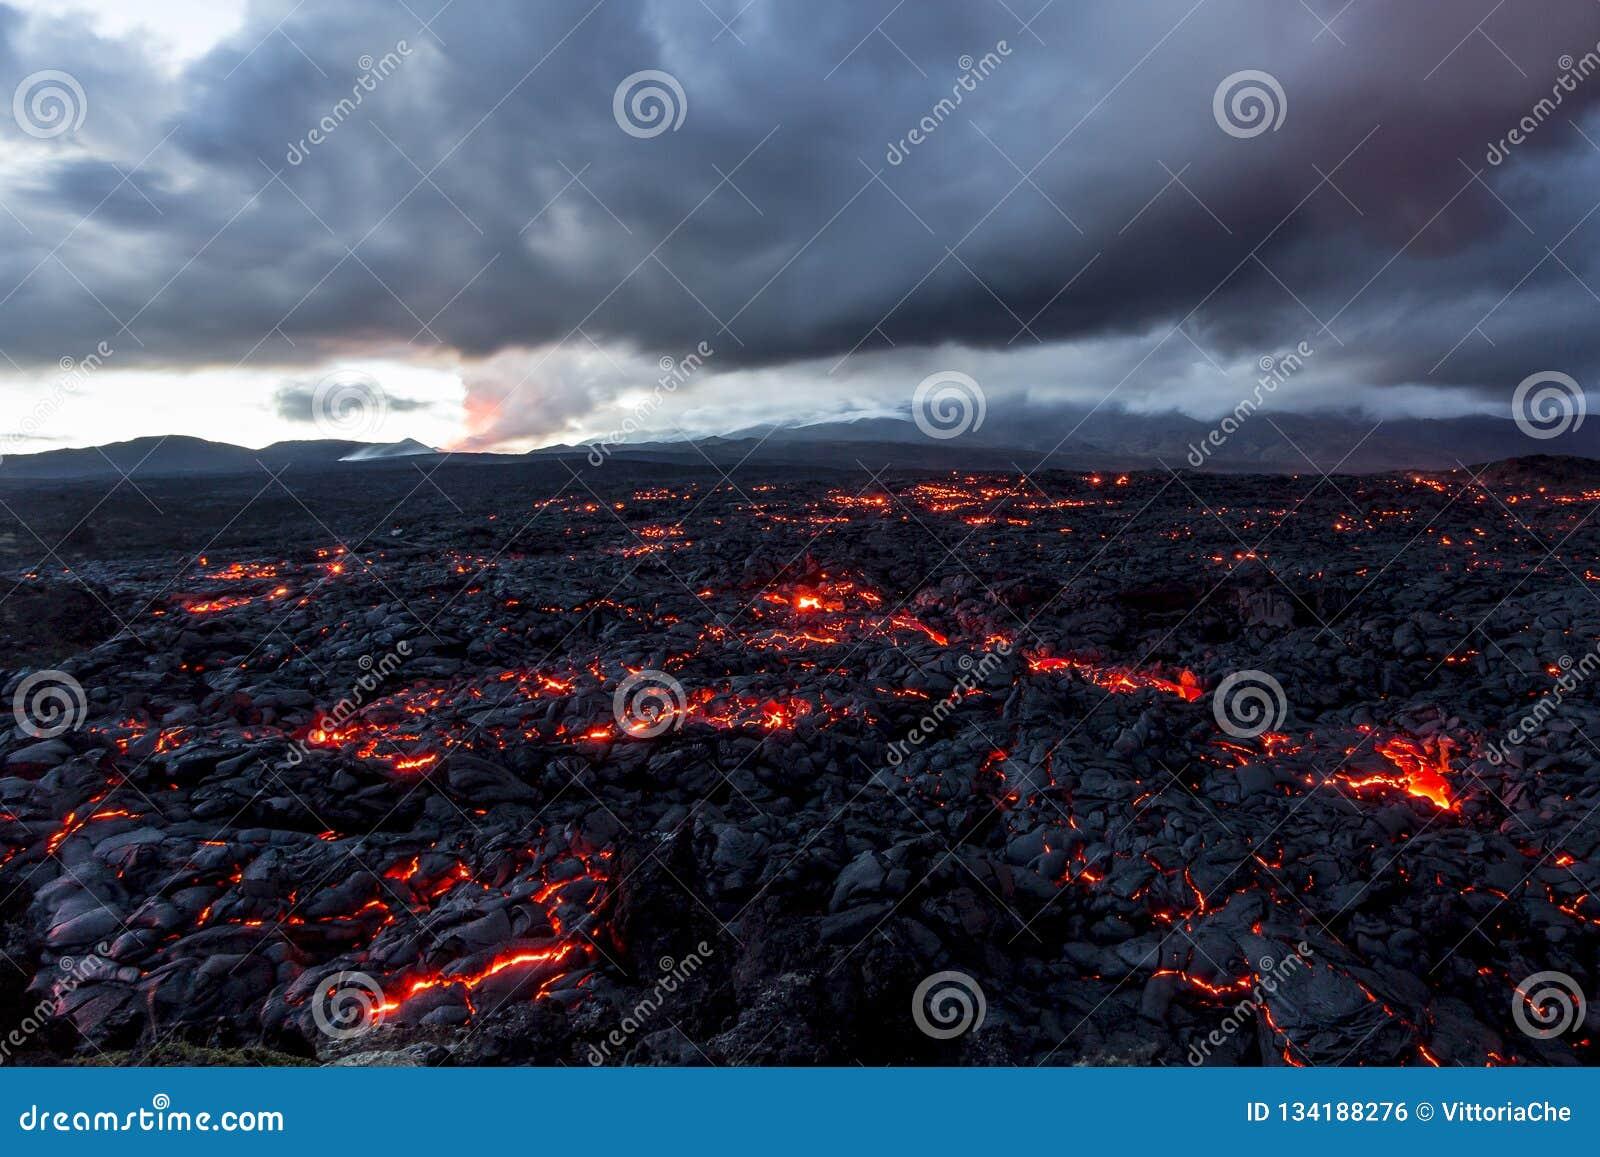 Volcano Tolbachik Lava Fields Ryssland Kamchatka, slutet av utbrottet av vulkan Tolbachik